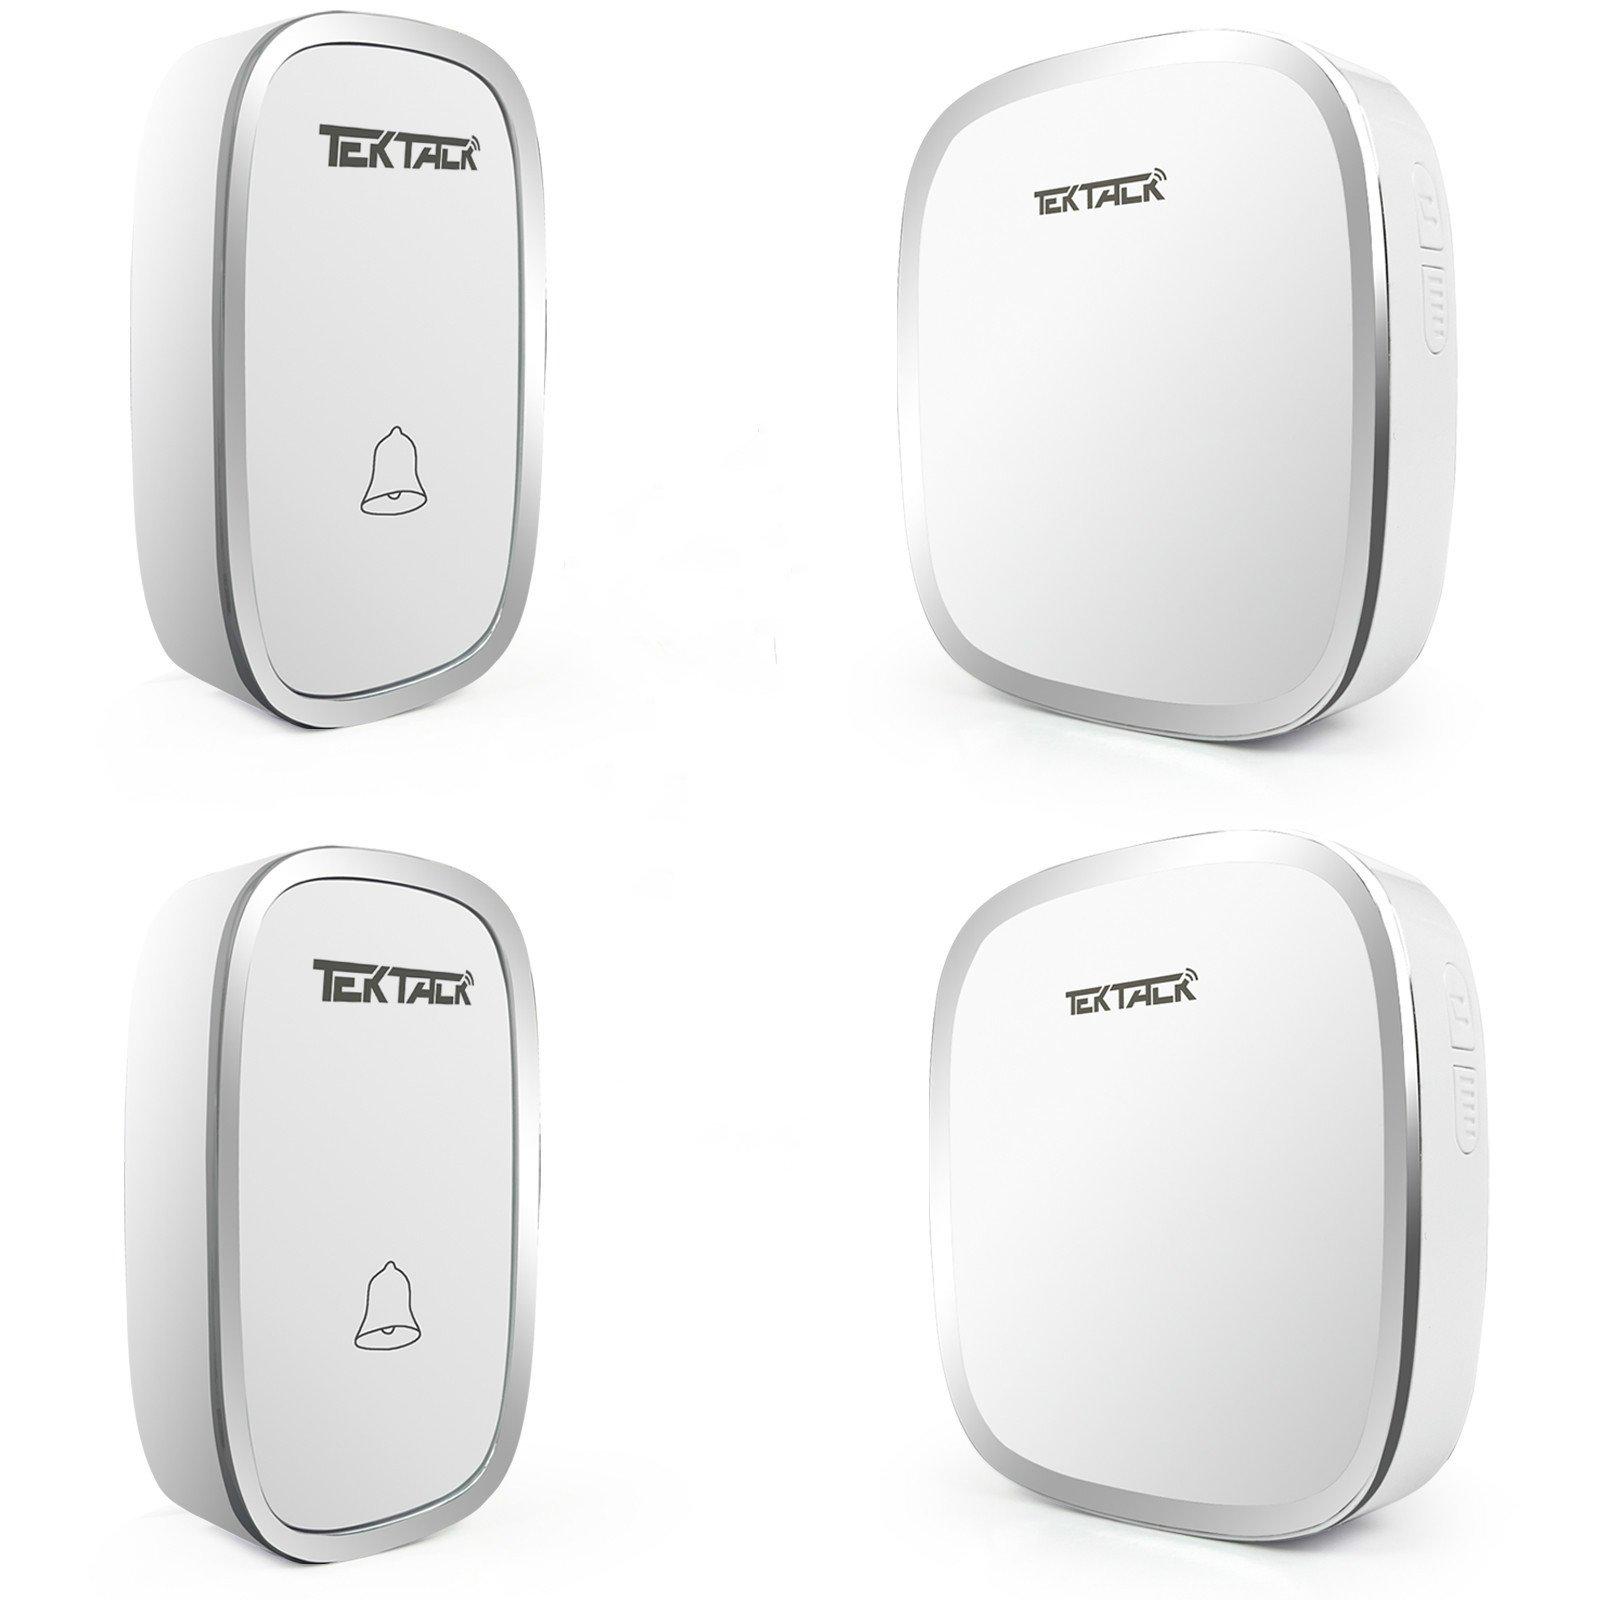 Tektalk Portable Wireless Doorbell Kit/ Metallic Edge Decored Door Bell / Waterproof Push Button with 36 Chime Tones and 4 Adjustable Volume (2 Transmitters & 2 Receivers) – White